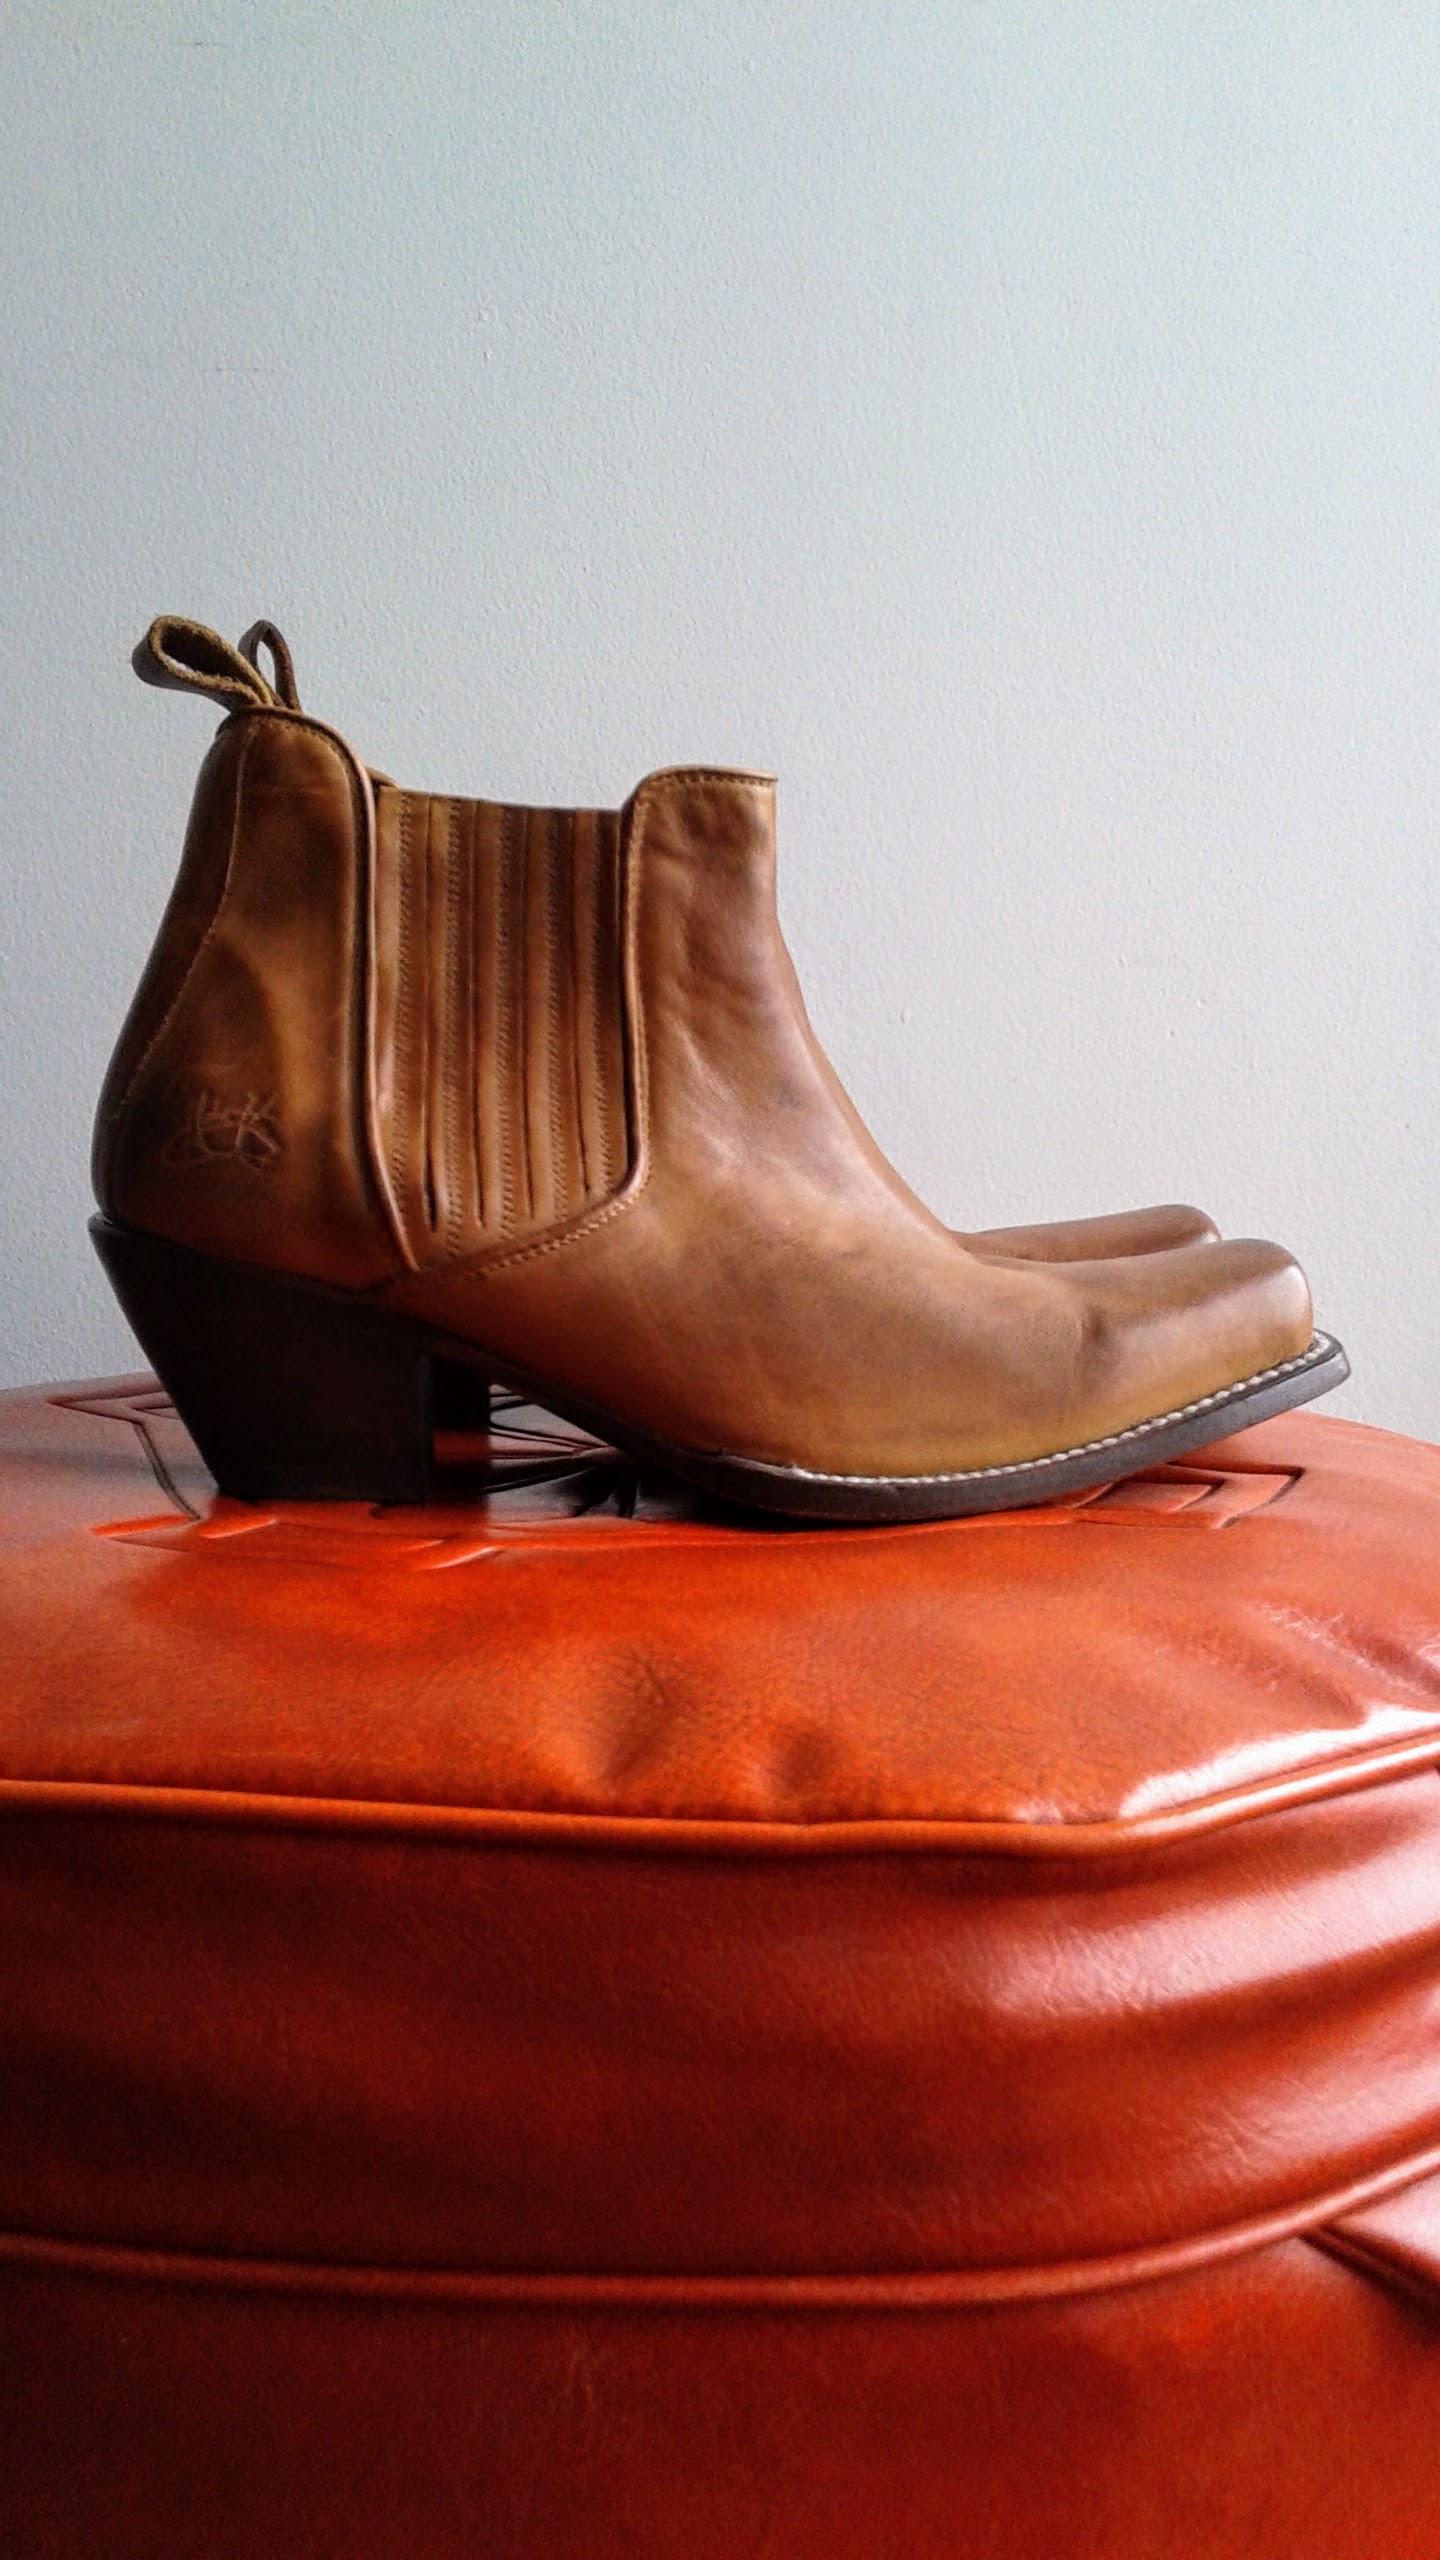 Fluevog boots; S10, $85